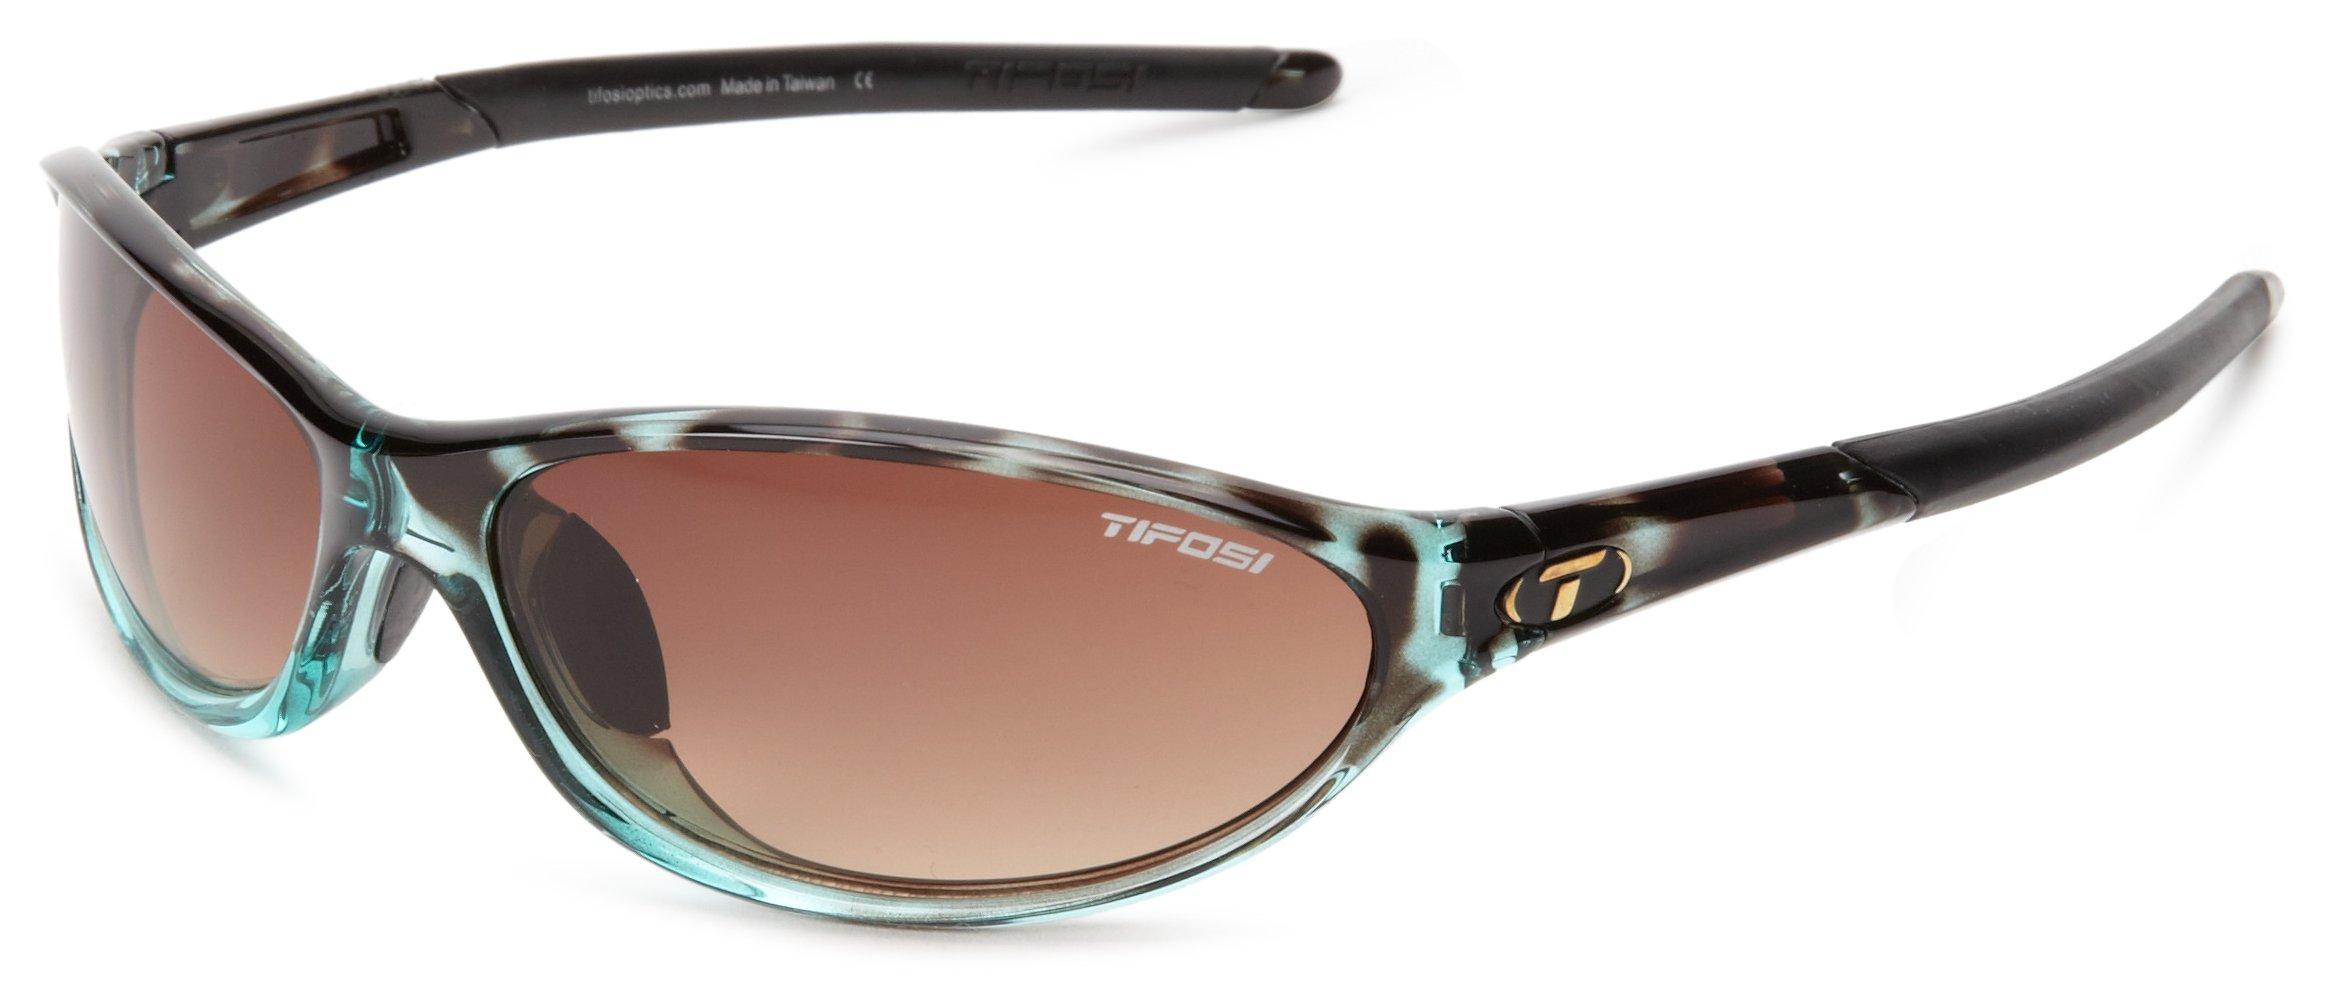 Tifosi womens Alpe 2.0 SingleLens Sunglasses,Blue Tortoise,62 mm by Tifosi